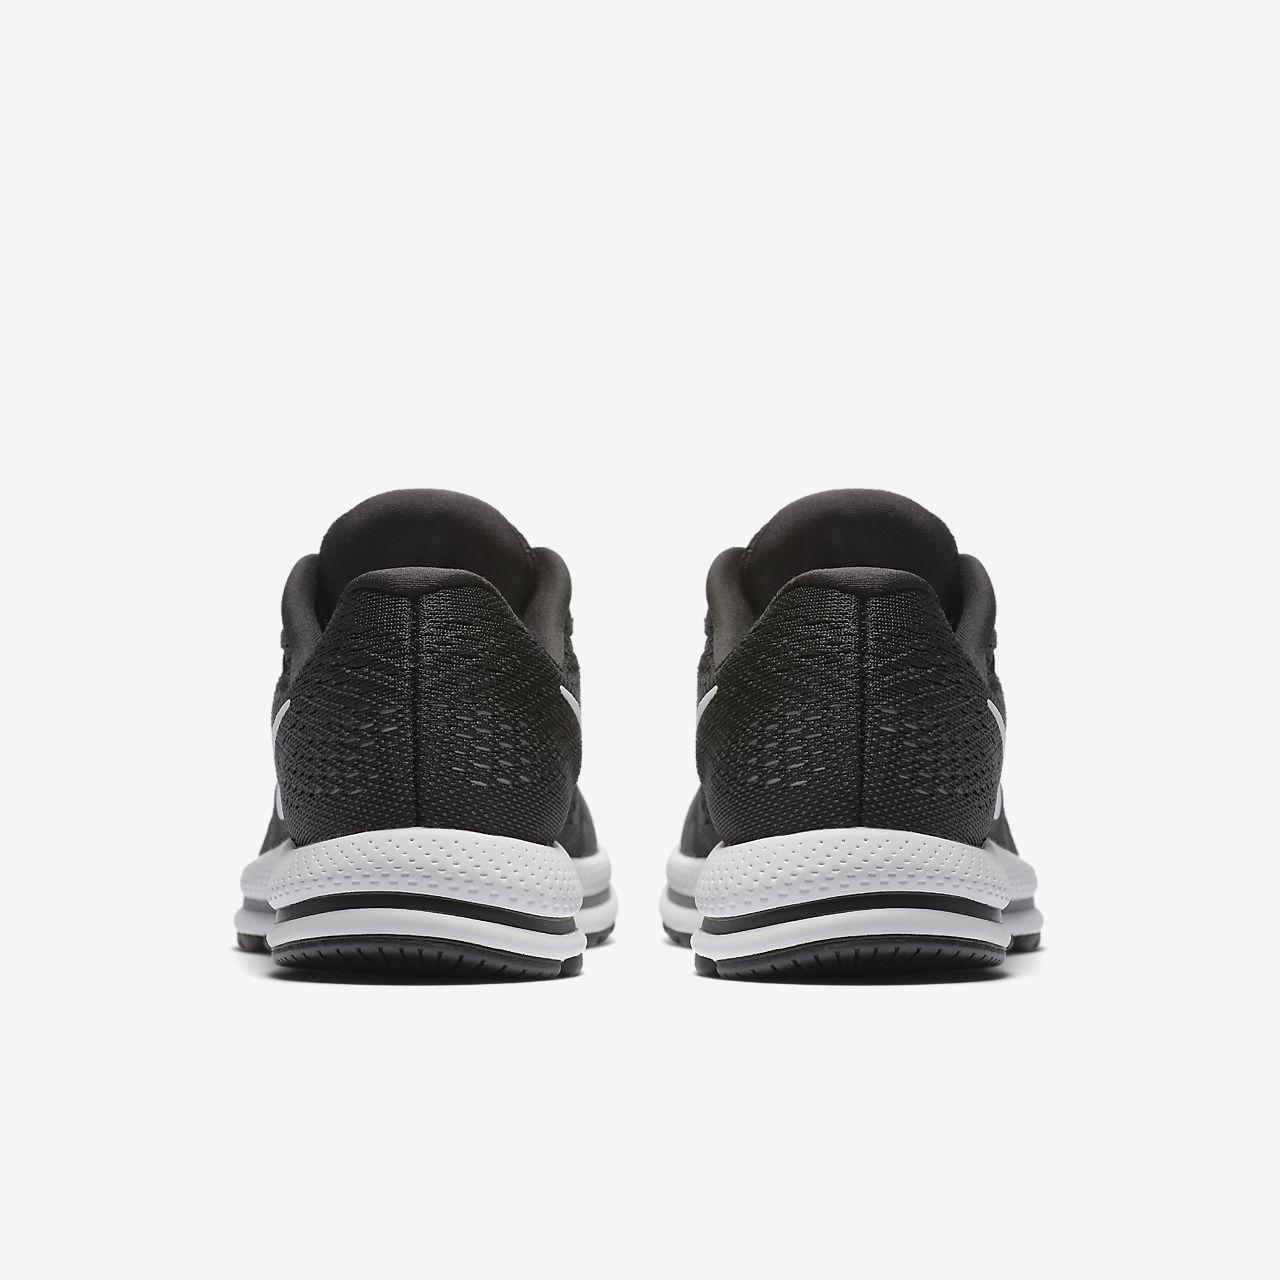 0b76deb750d56 Nike Air Zoom Vomero 12 Women s Running Shoe. Nike.com NL